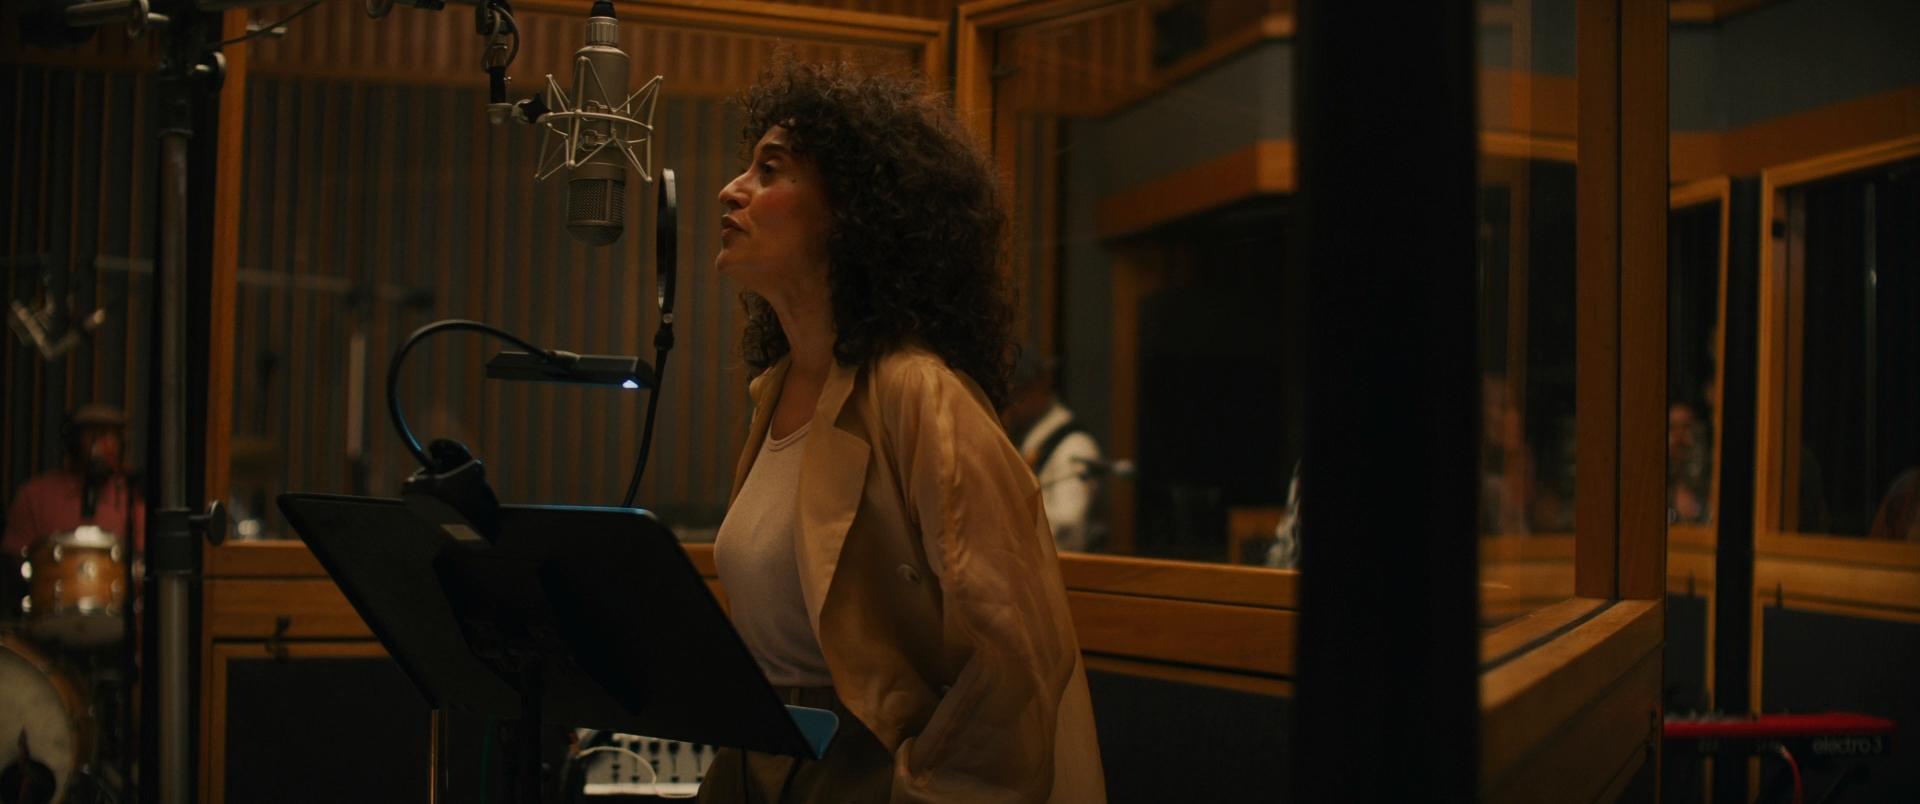 Música Glamour y Fama (2020) 1080p BDRip Latino